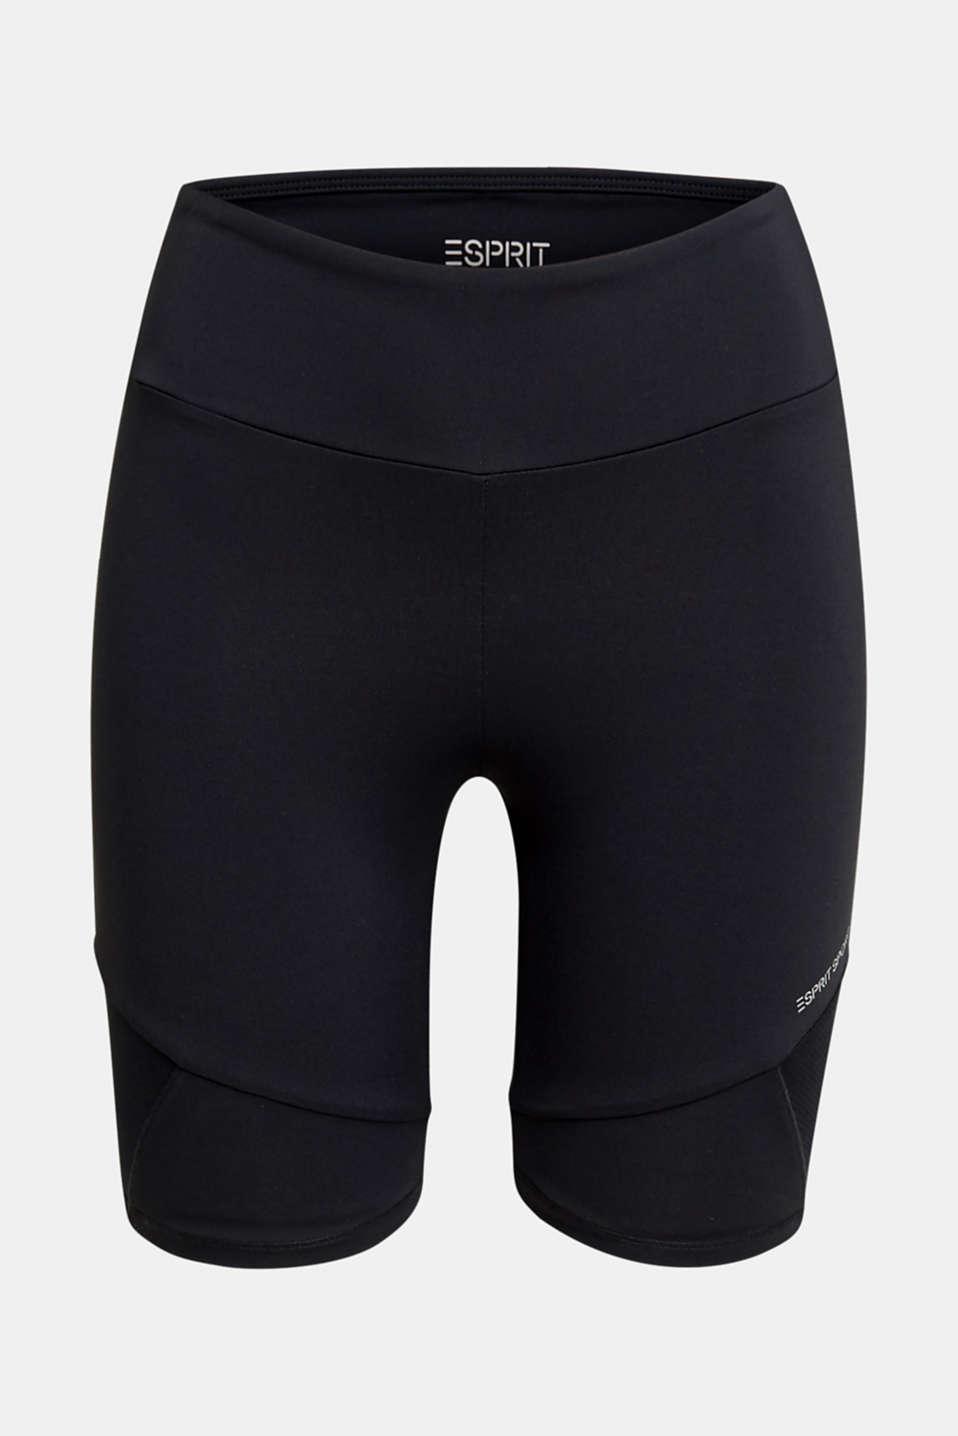 E-DRY leggings with mesh details, BLACK, detail image number 6